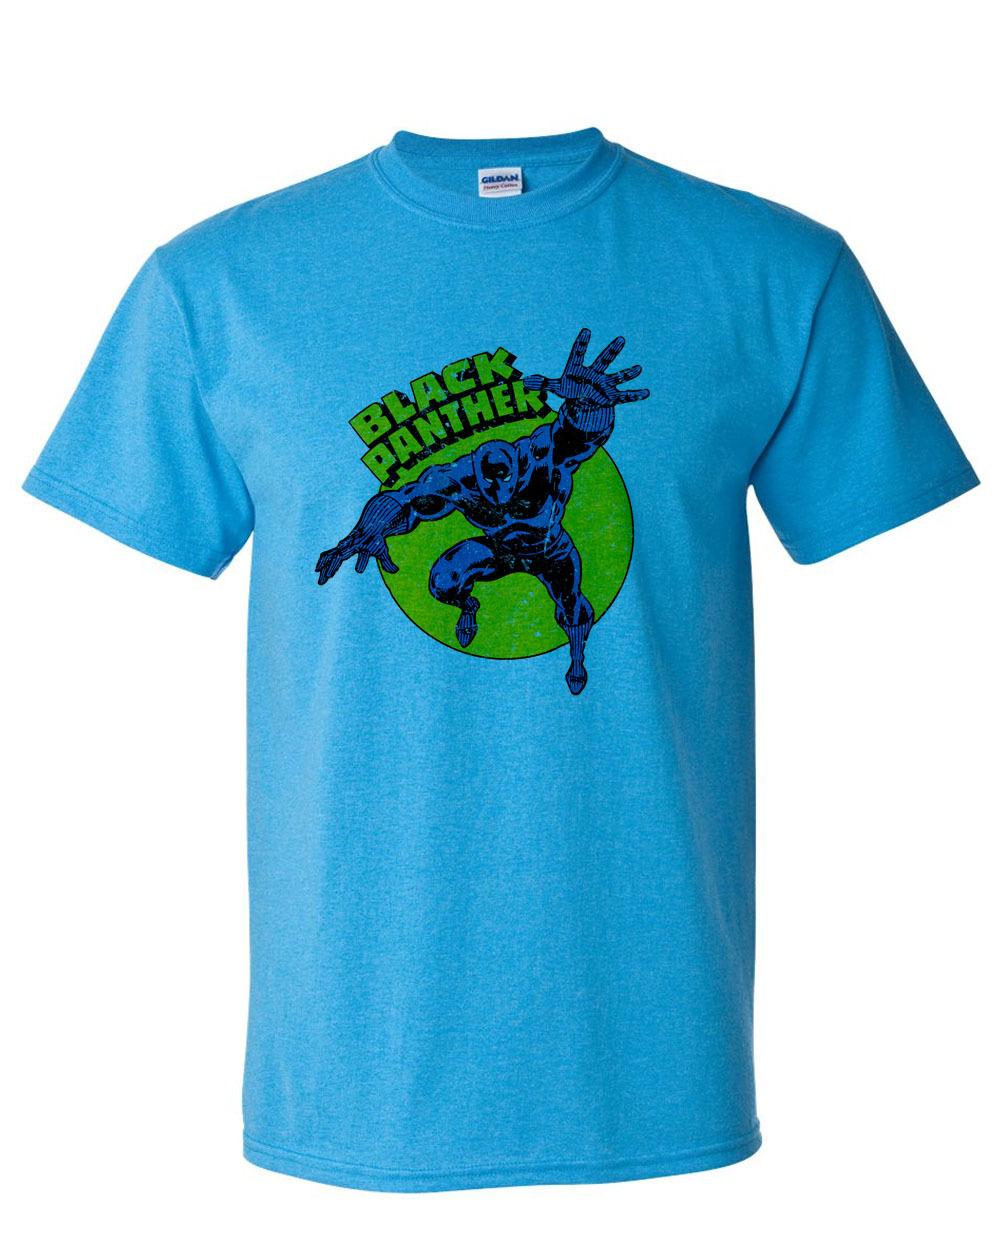 Black panther t shirt retro marvel comic book superhero for T shirt graphics for sale